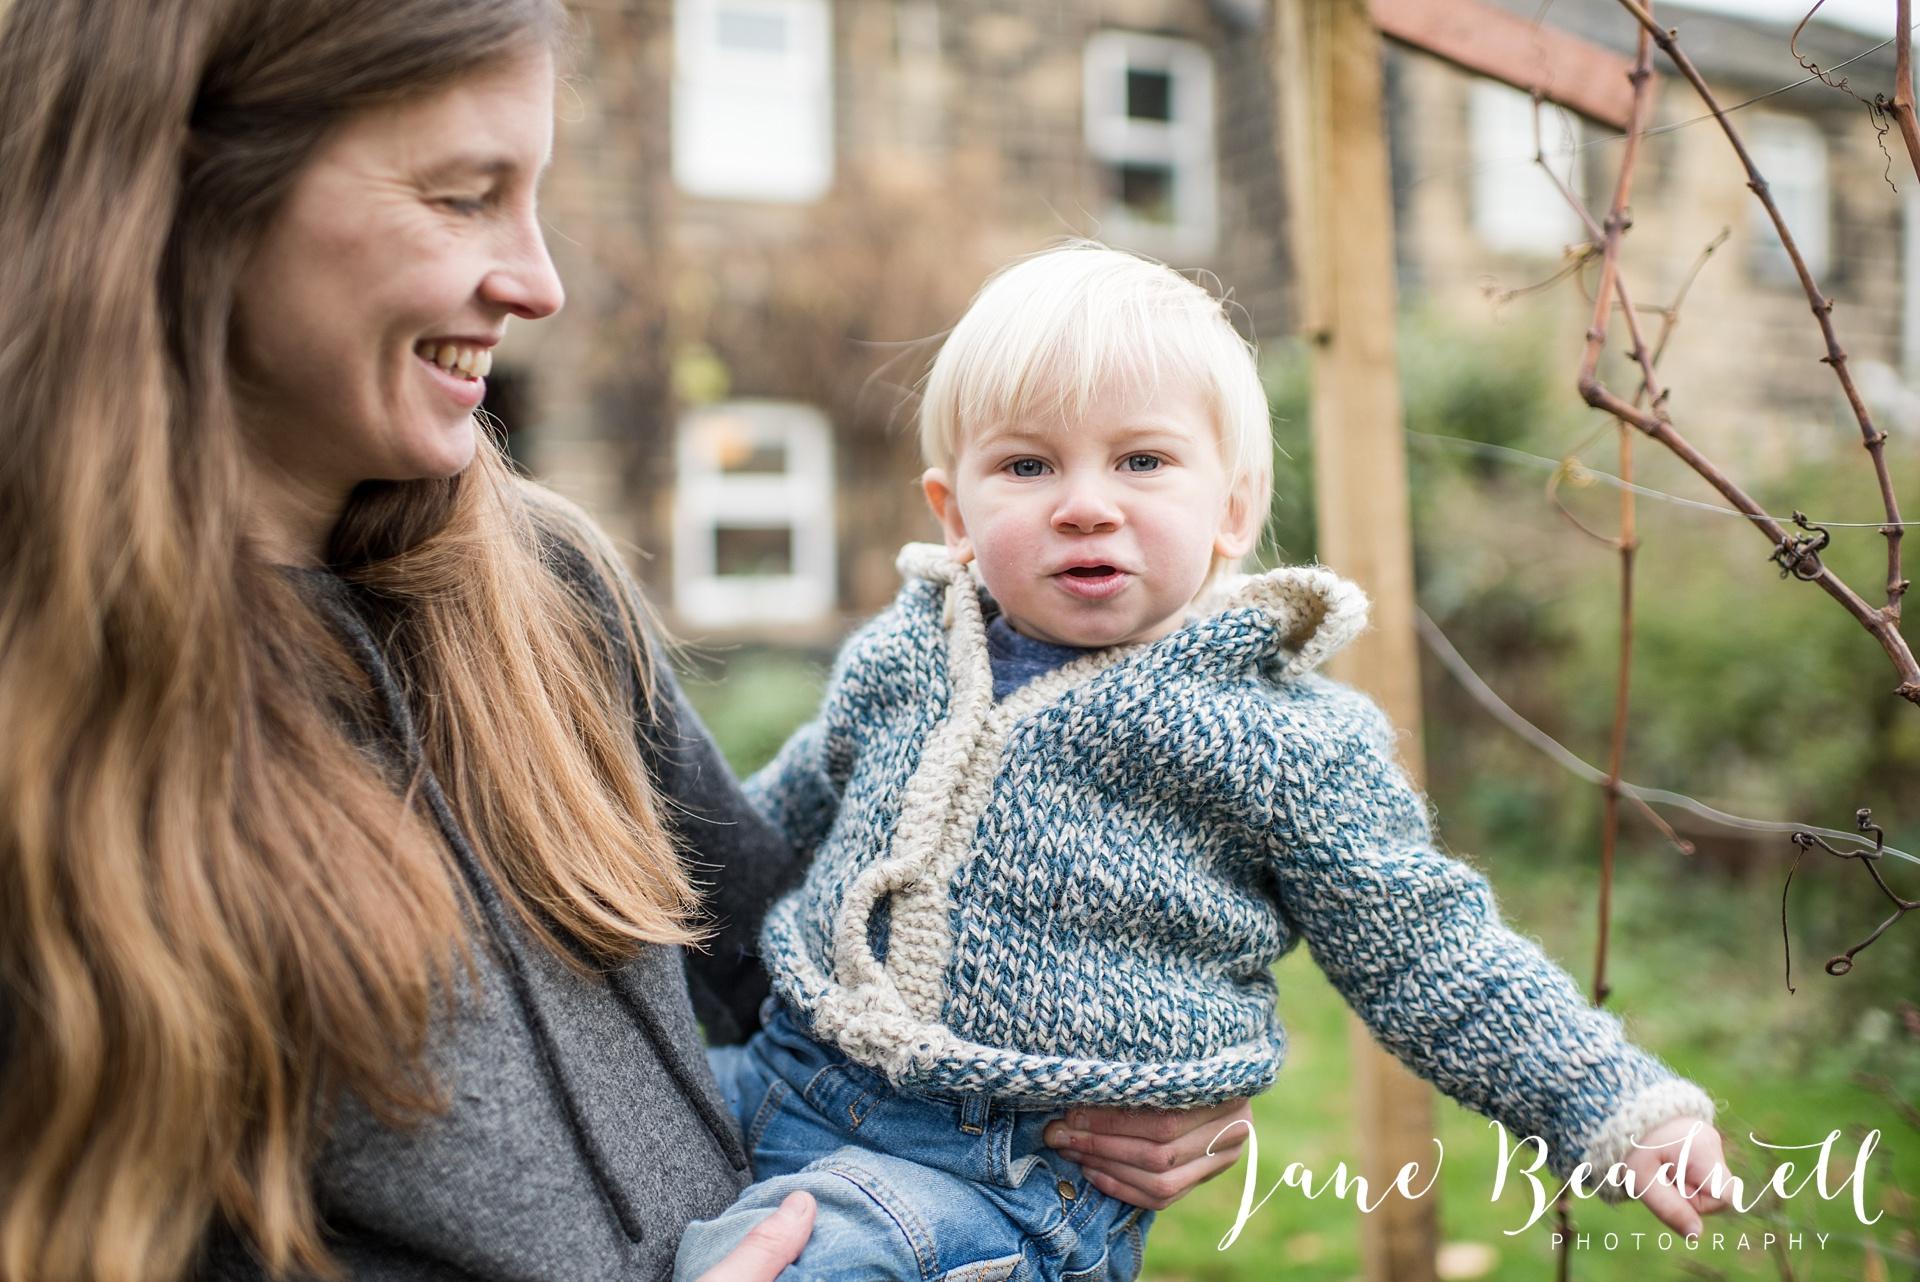 Otley family portrait photographer Jane Beadnell Photography Otley portrait photographer, Yorkshire family photographer